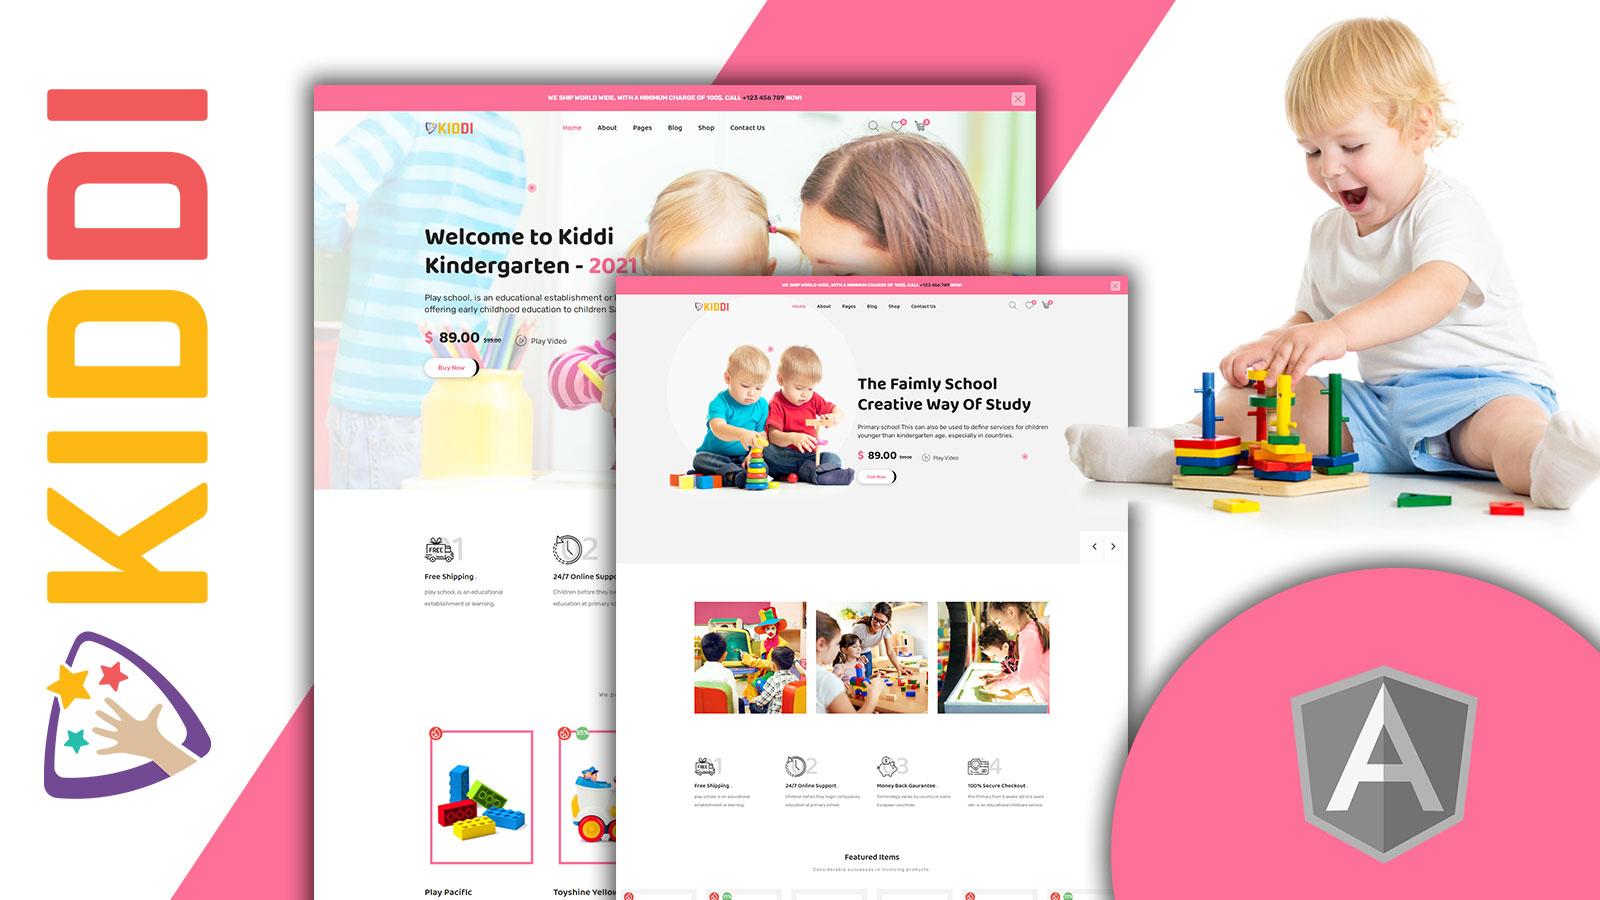 Kiddi New Born Kids Store shop Angular Website Template